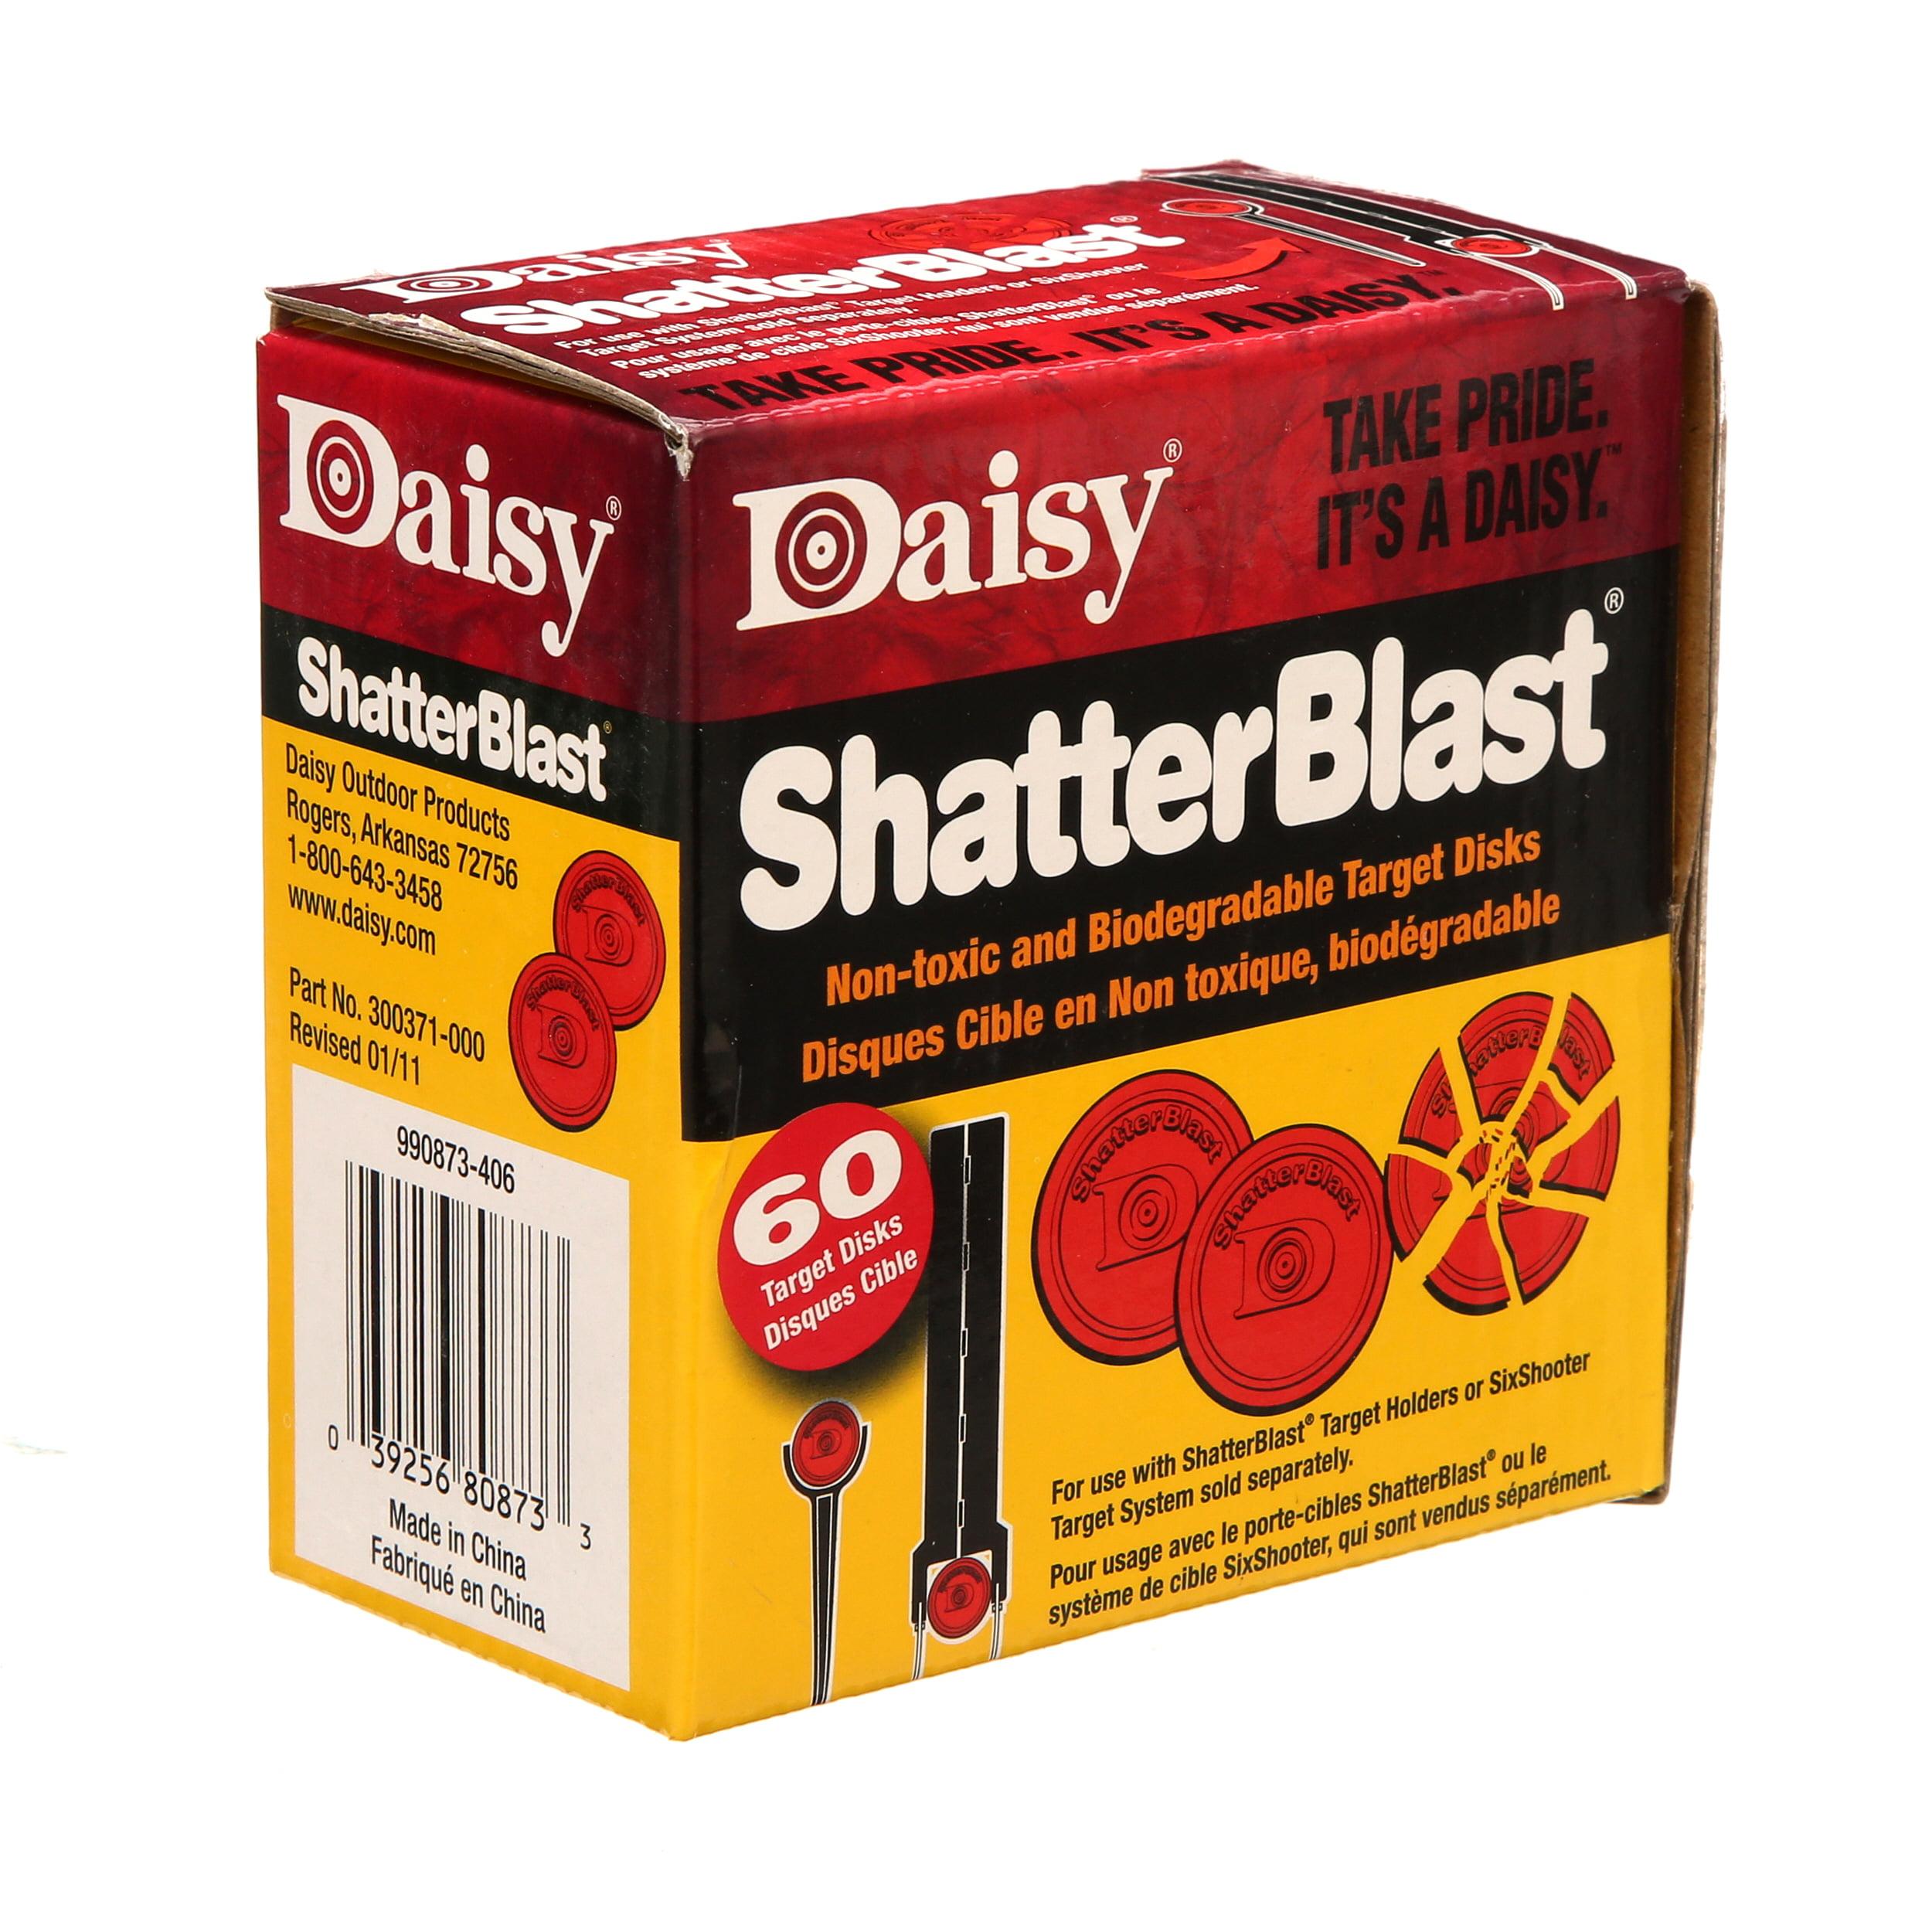 Daisy Shatterblast Targets 990873-406 60 ct.